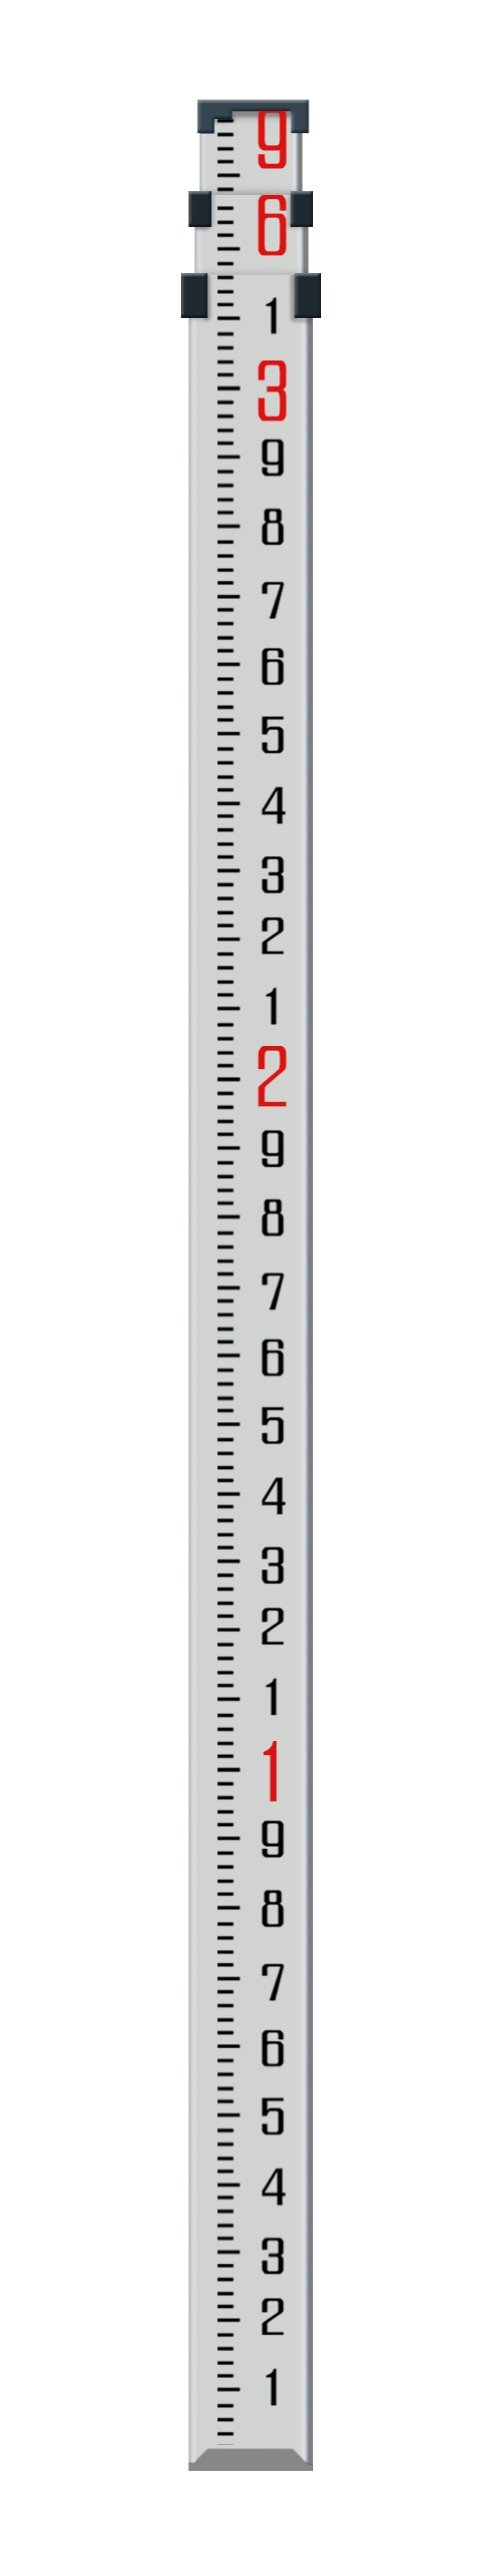 NWI NAR09T 9-Feet  3 Section 10ths Telescopic Aluminum Rod